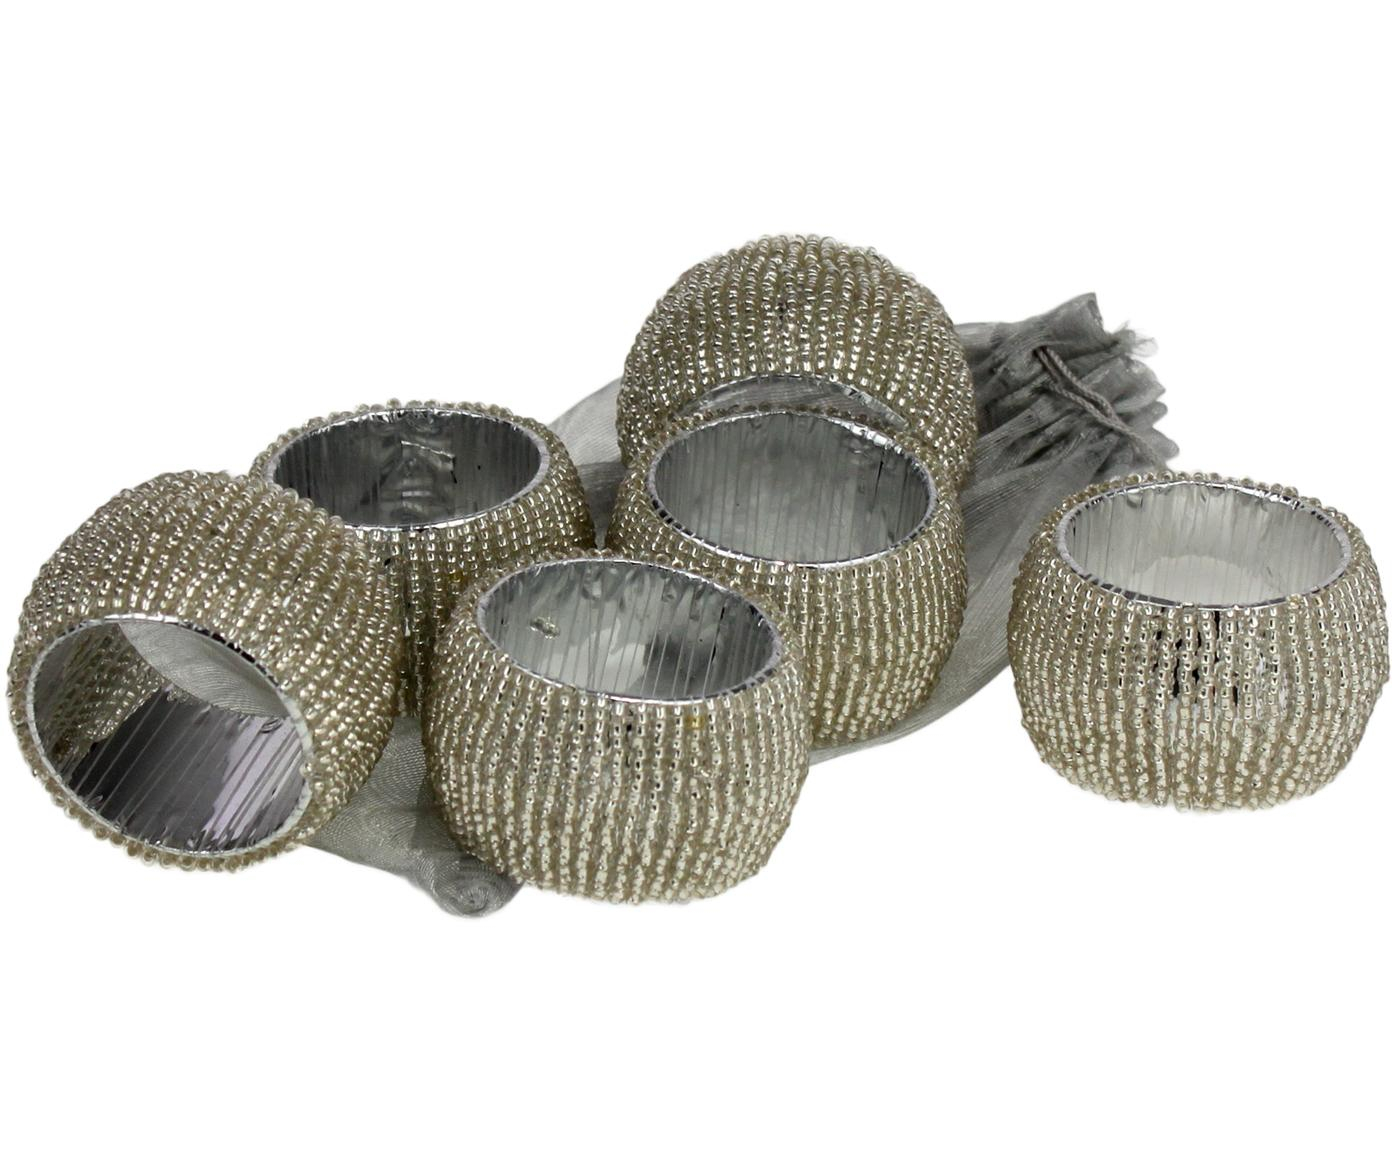 Serviettenringe Perla, 6 Stück, Silberfarben, Ø 5 x H 3 cm